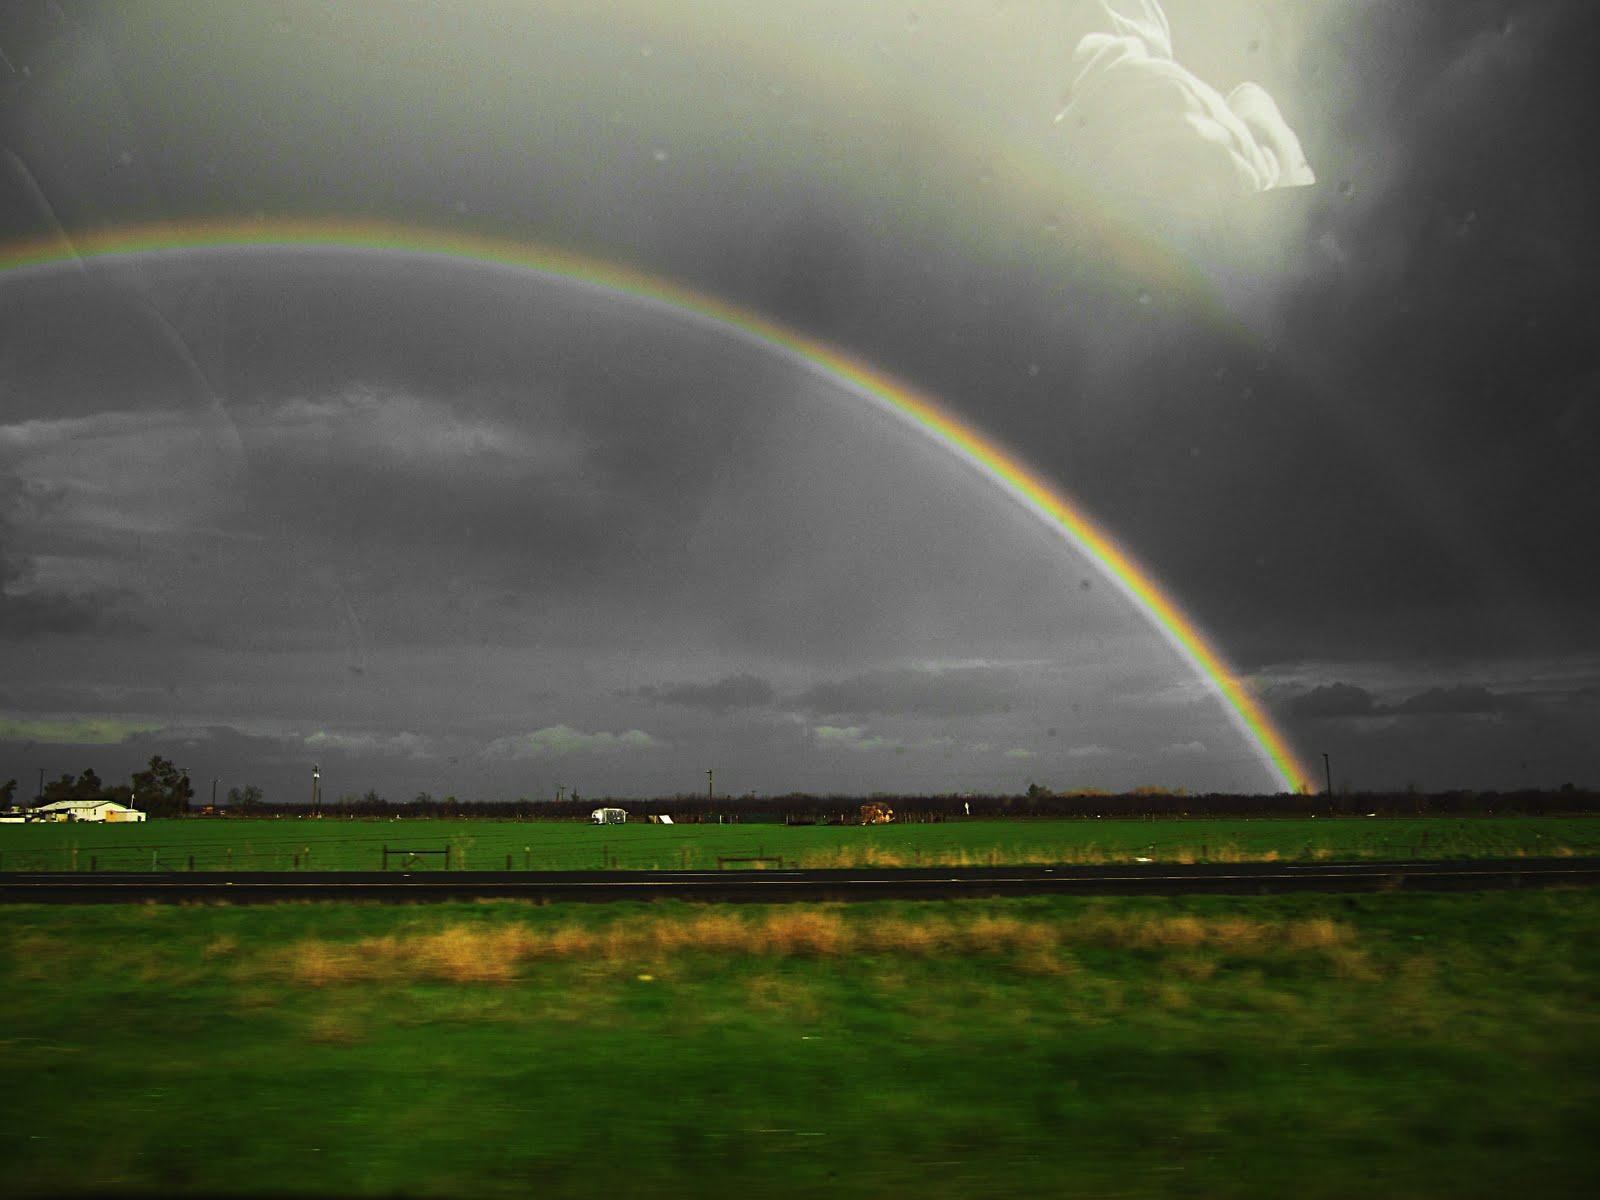 [photoshop-rainbow]